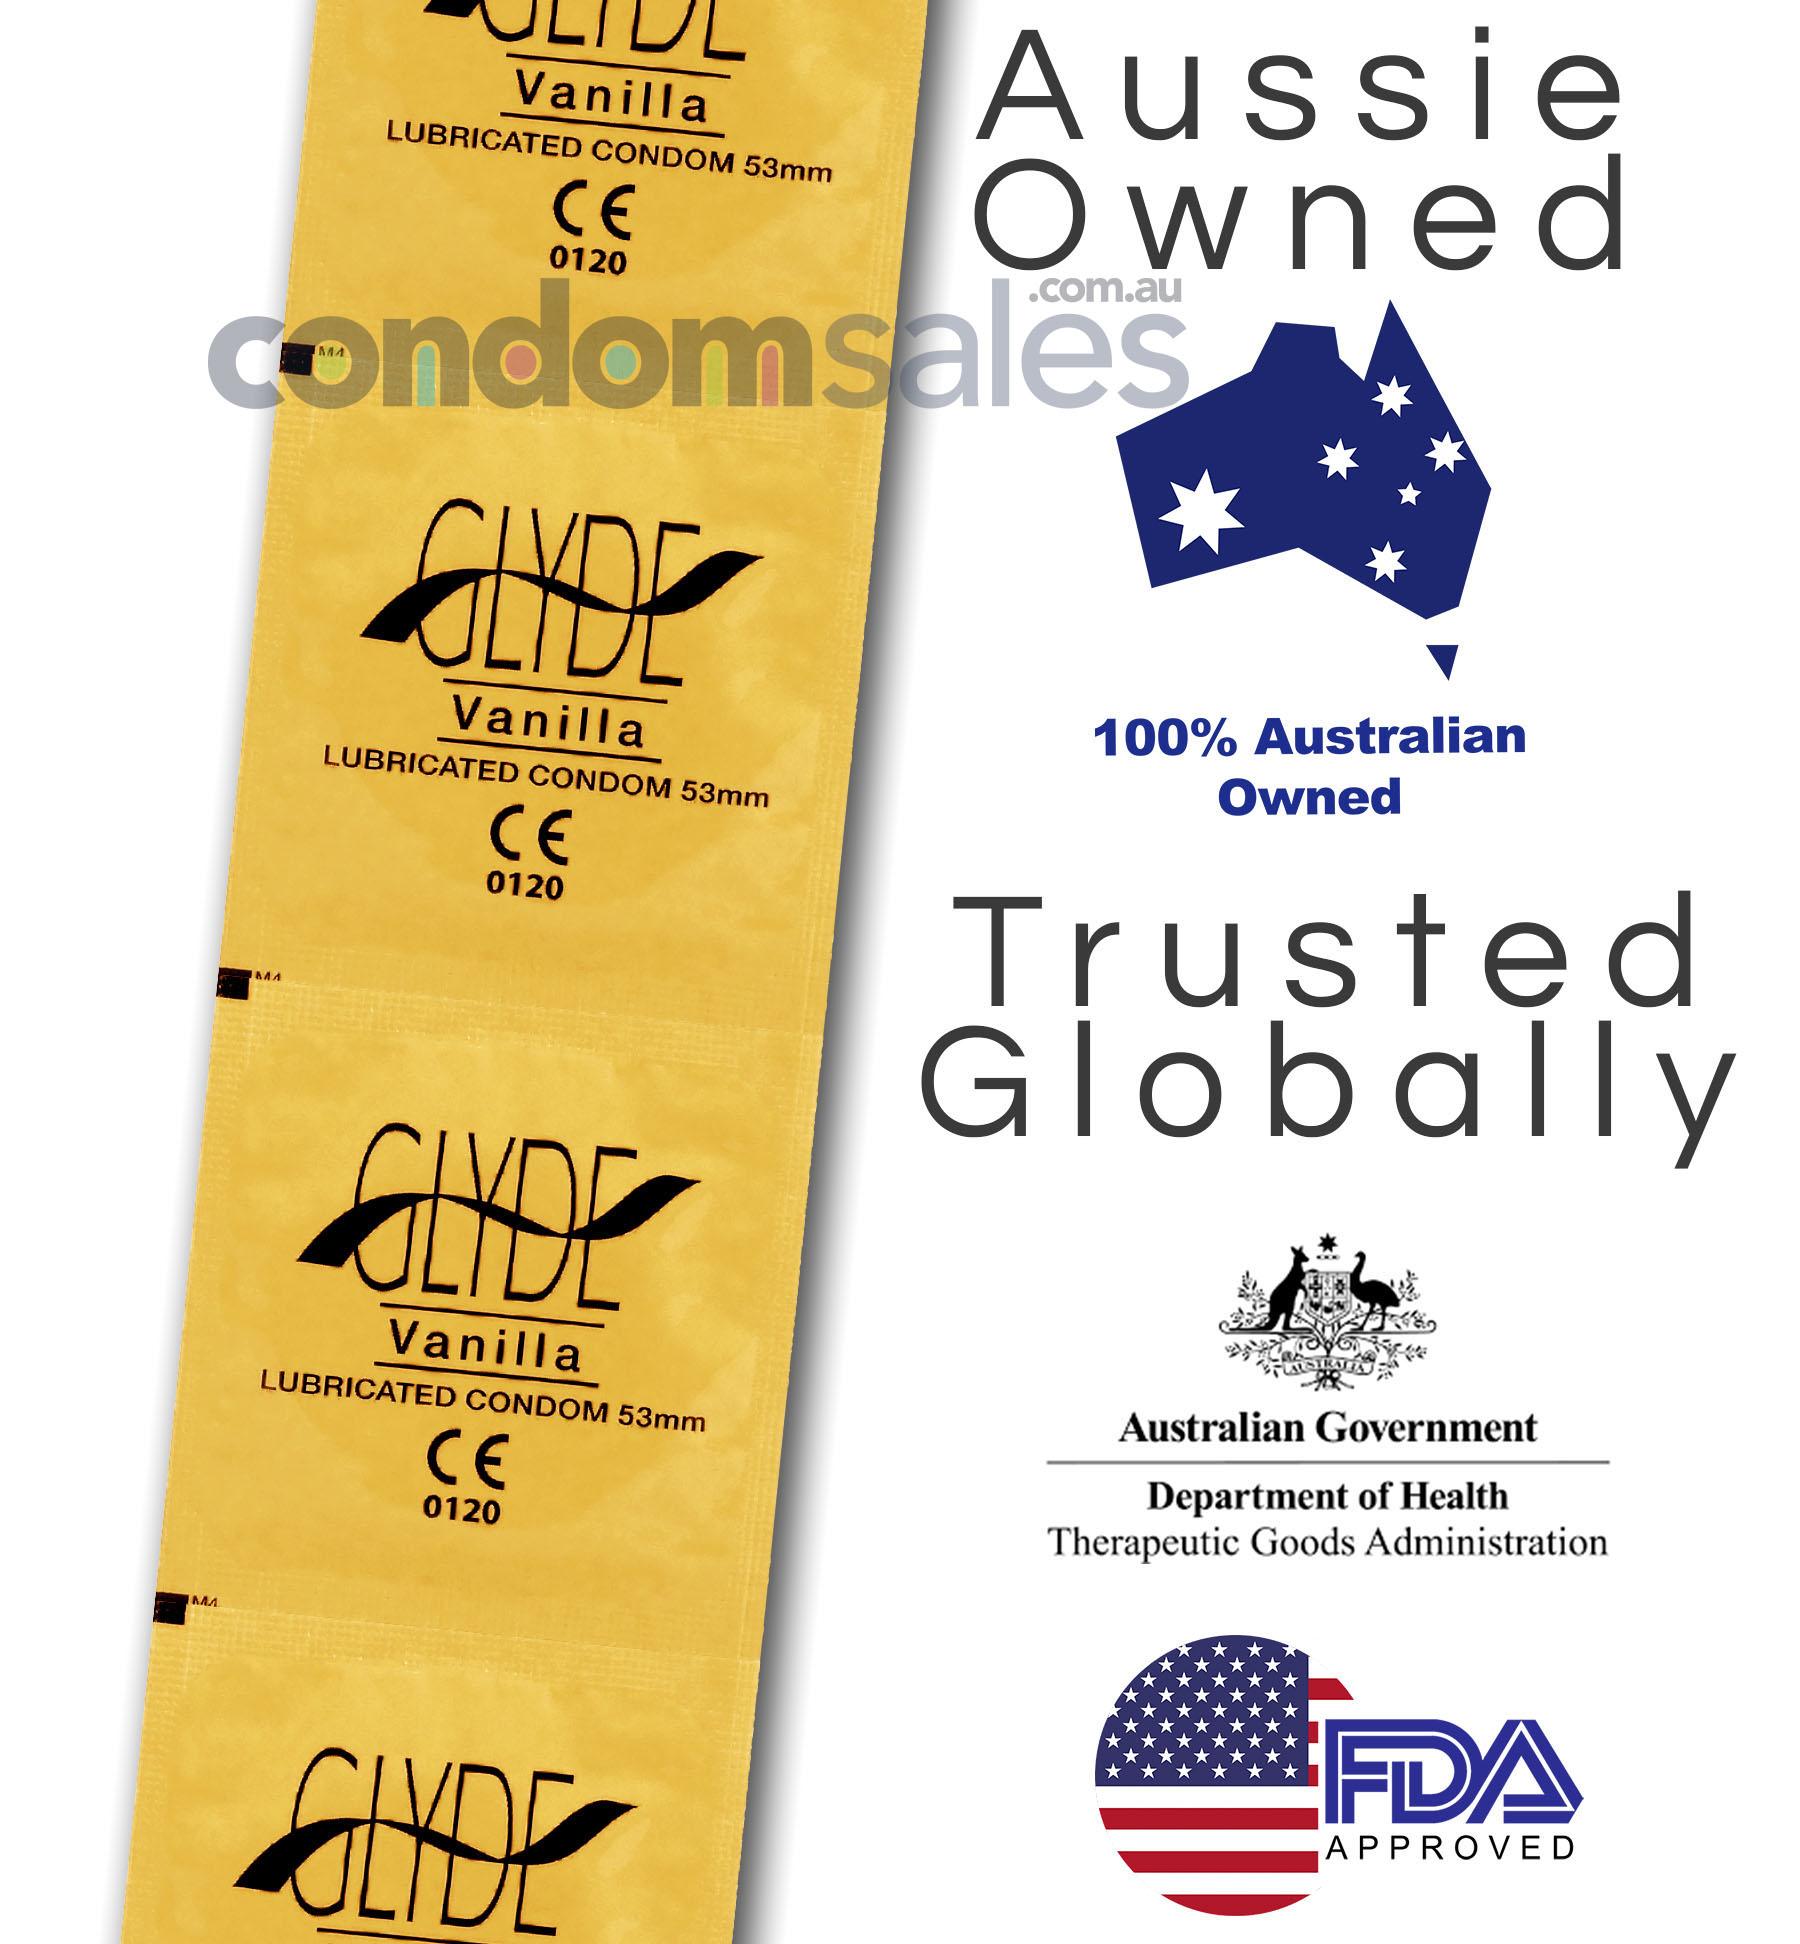 Glyde Vanilla Condoms (24 Loose Packed) - Buy Condoms Online